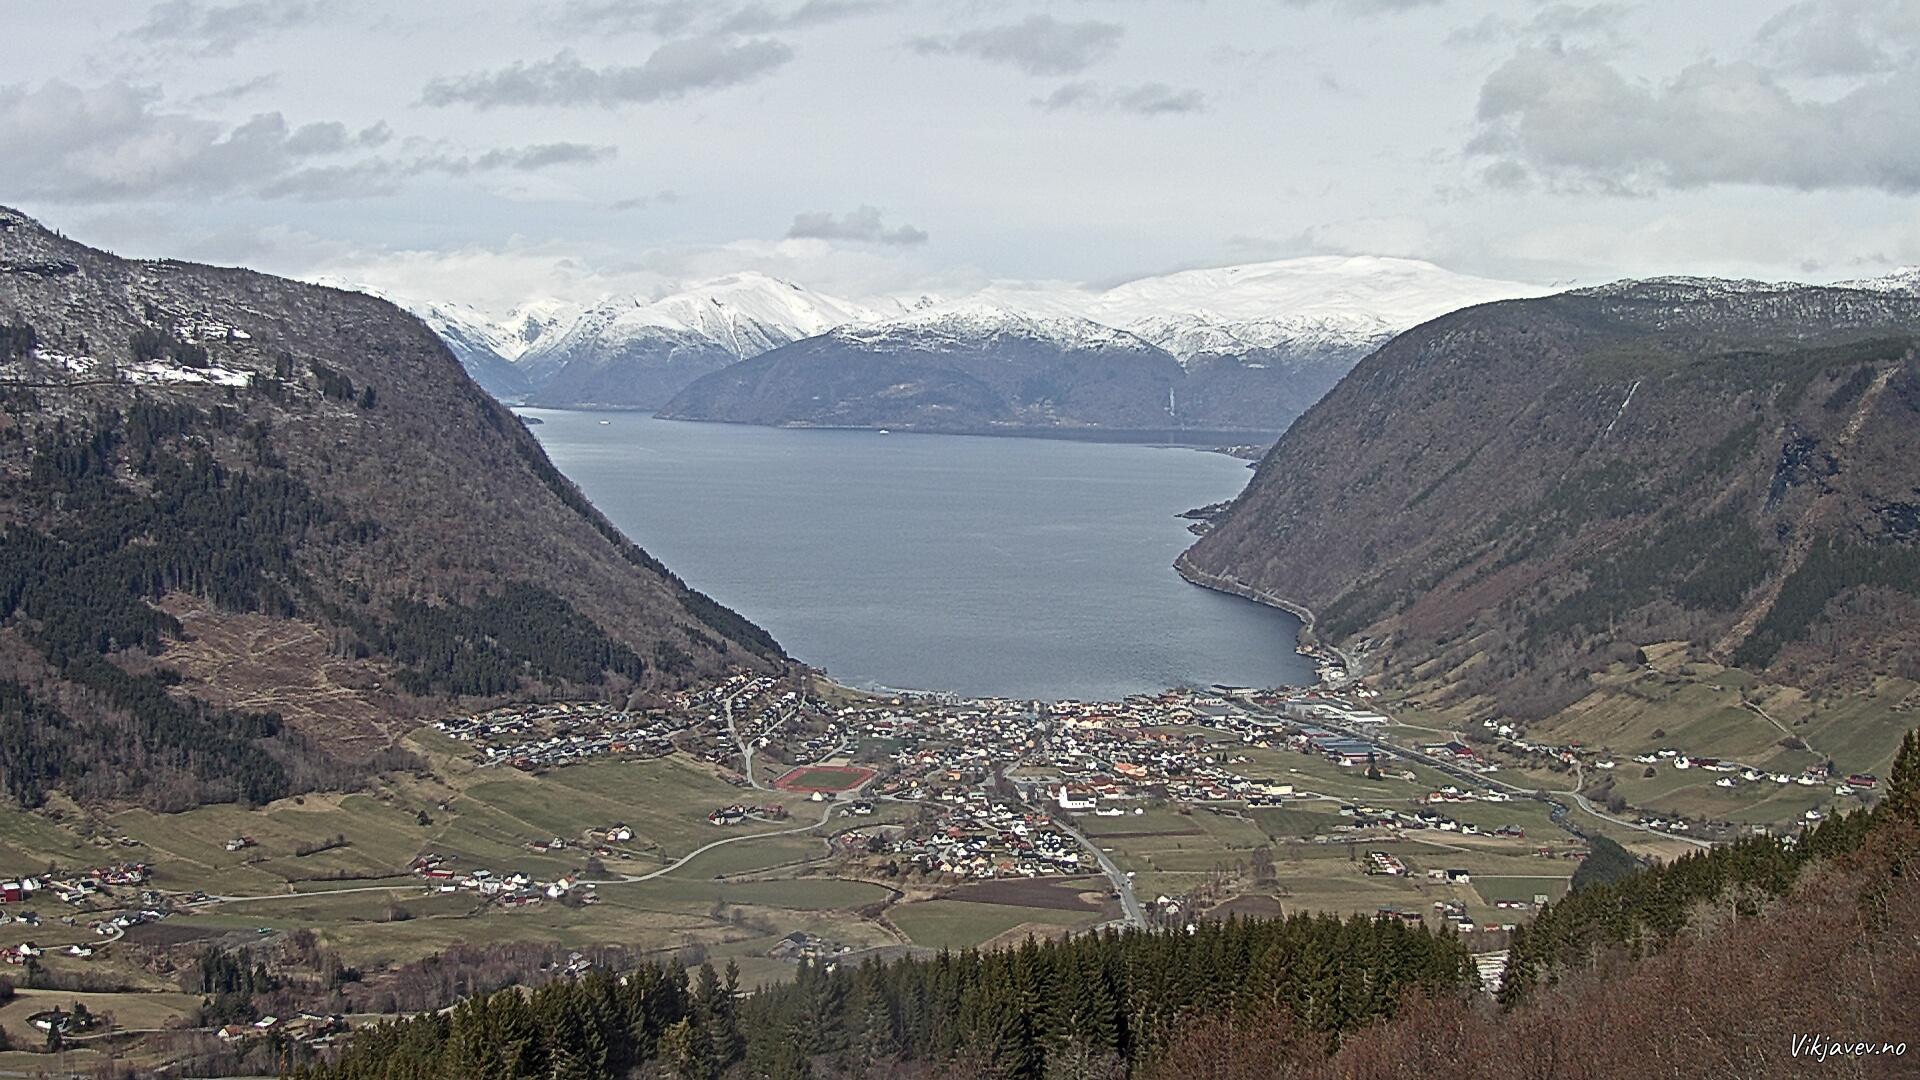 Vik i Sogn April 1, 2019 15:00